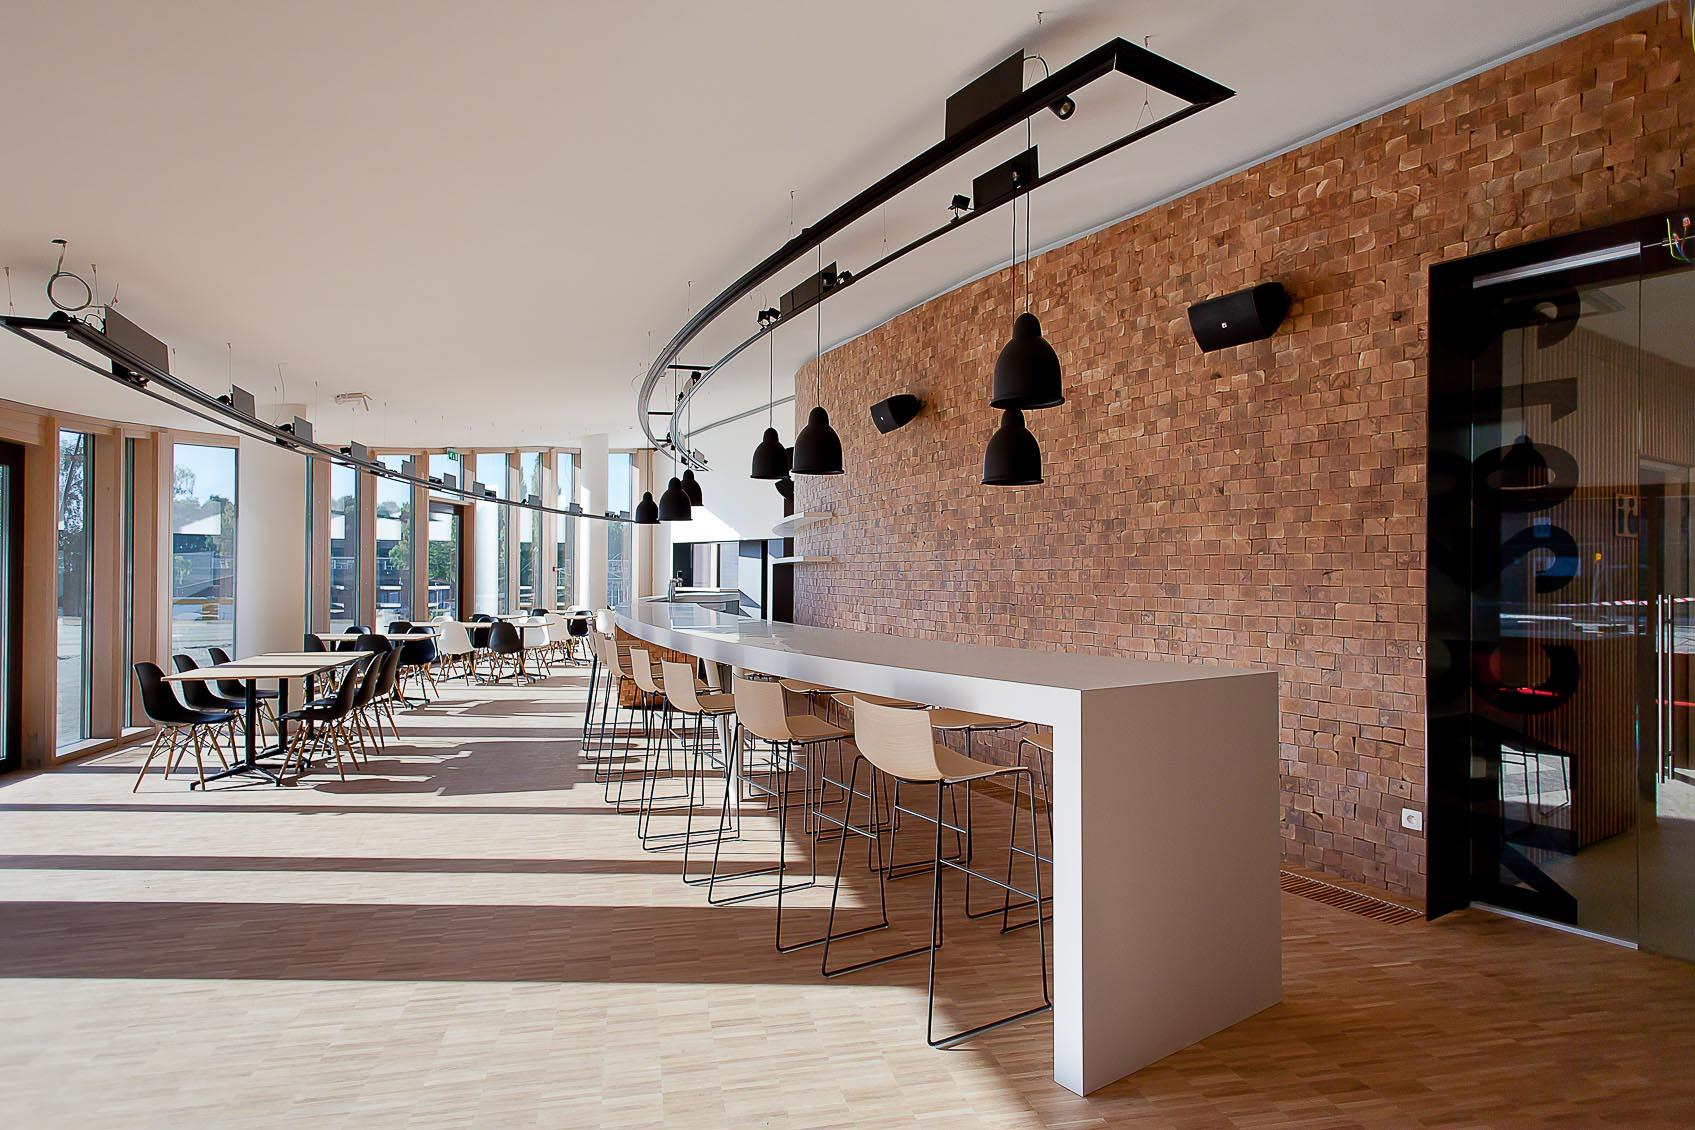 technisch architecturale verlichtingsconcept voor cafetaria nac